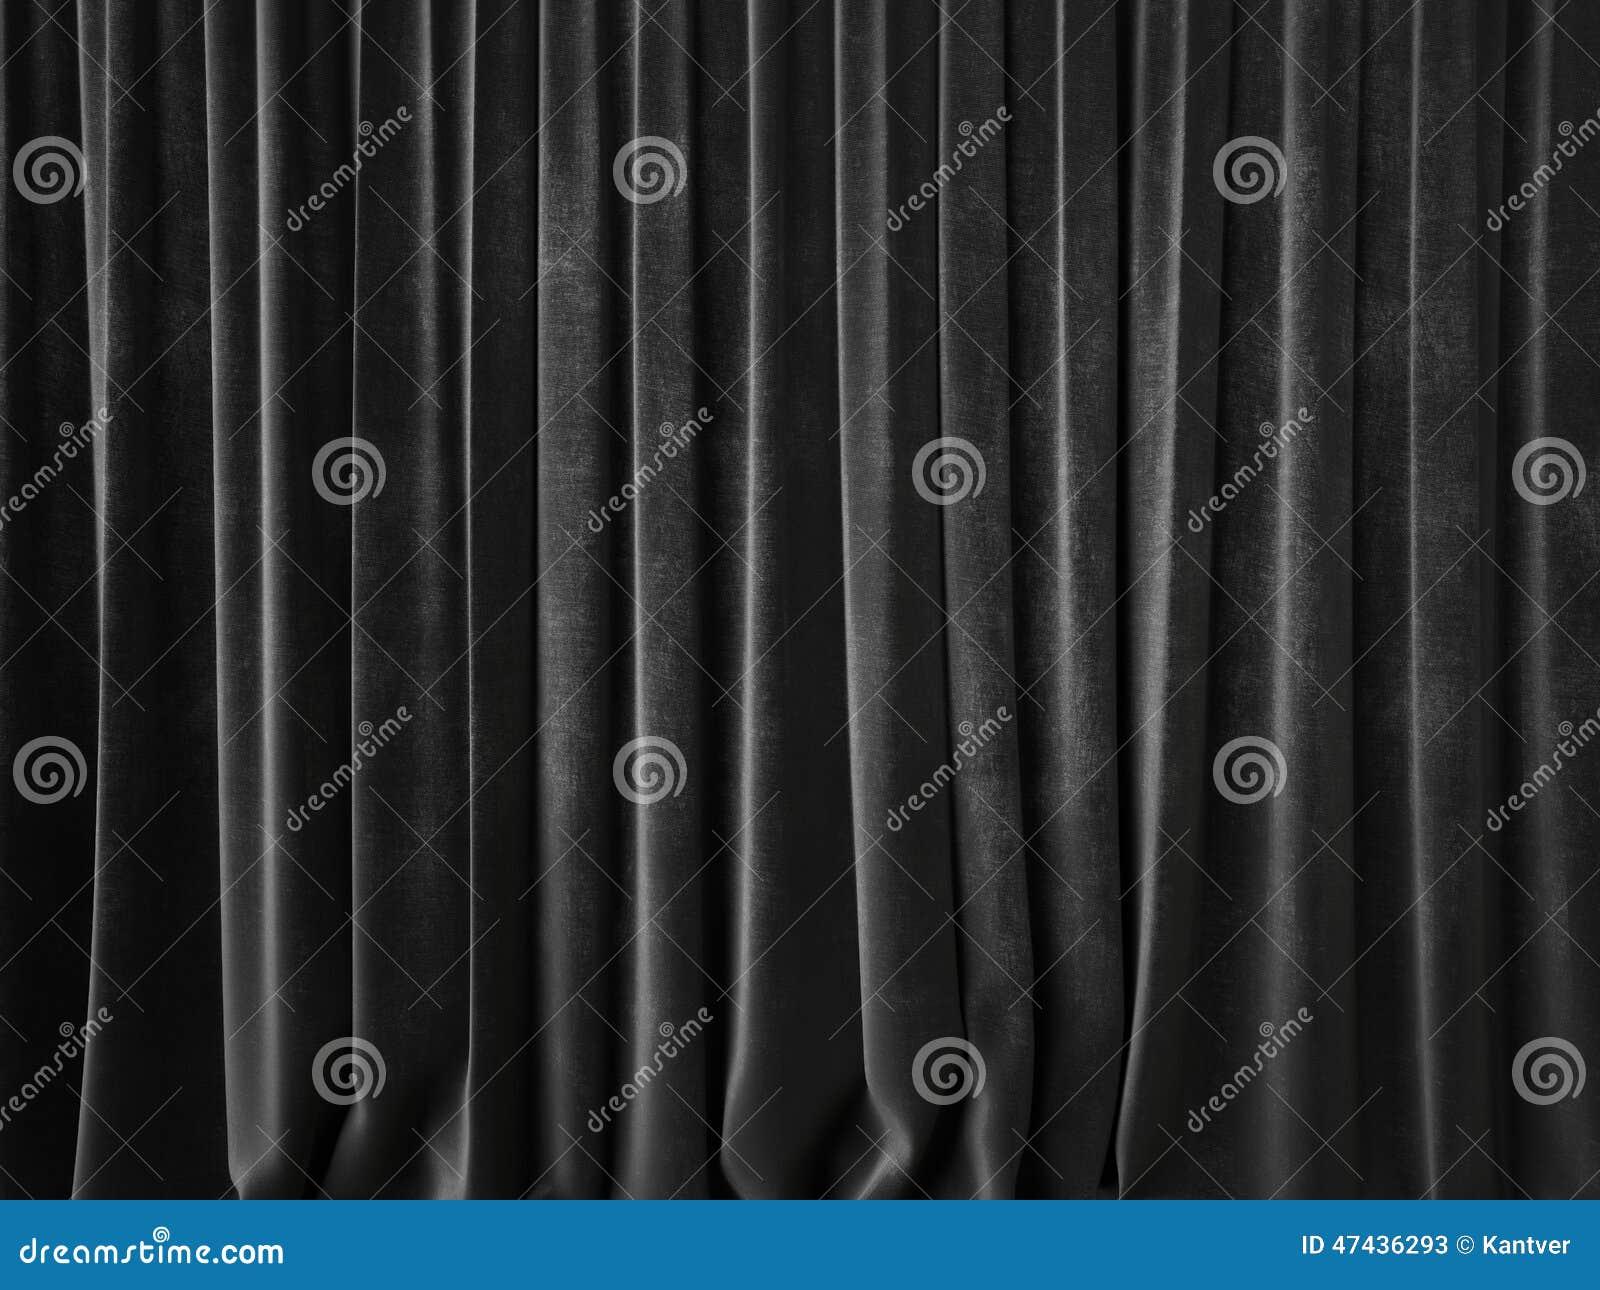 Dark gray curtains - Dark Gray Curtain